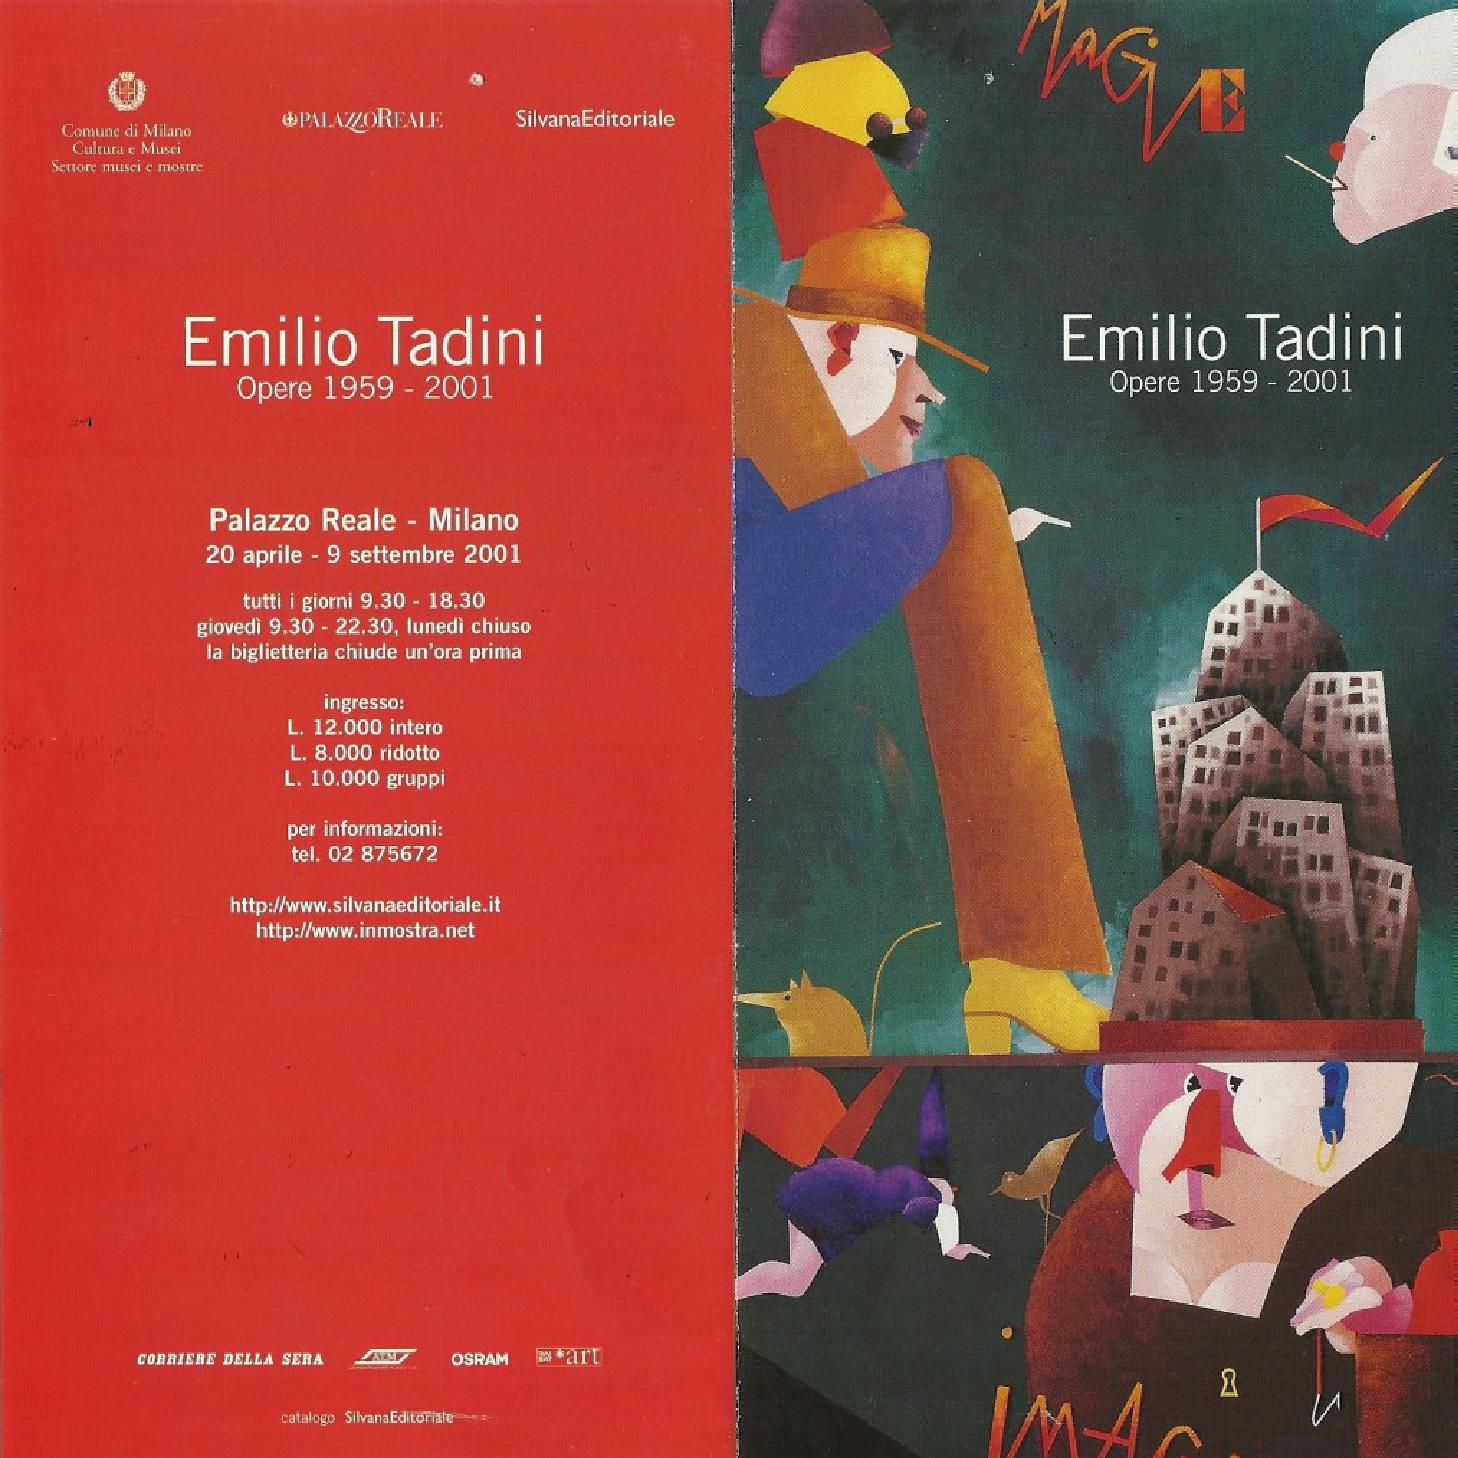 PALAZZO REALE – EMILIO TADINI